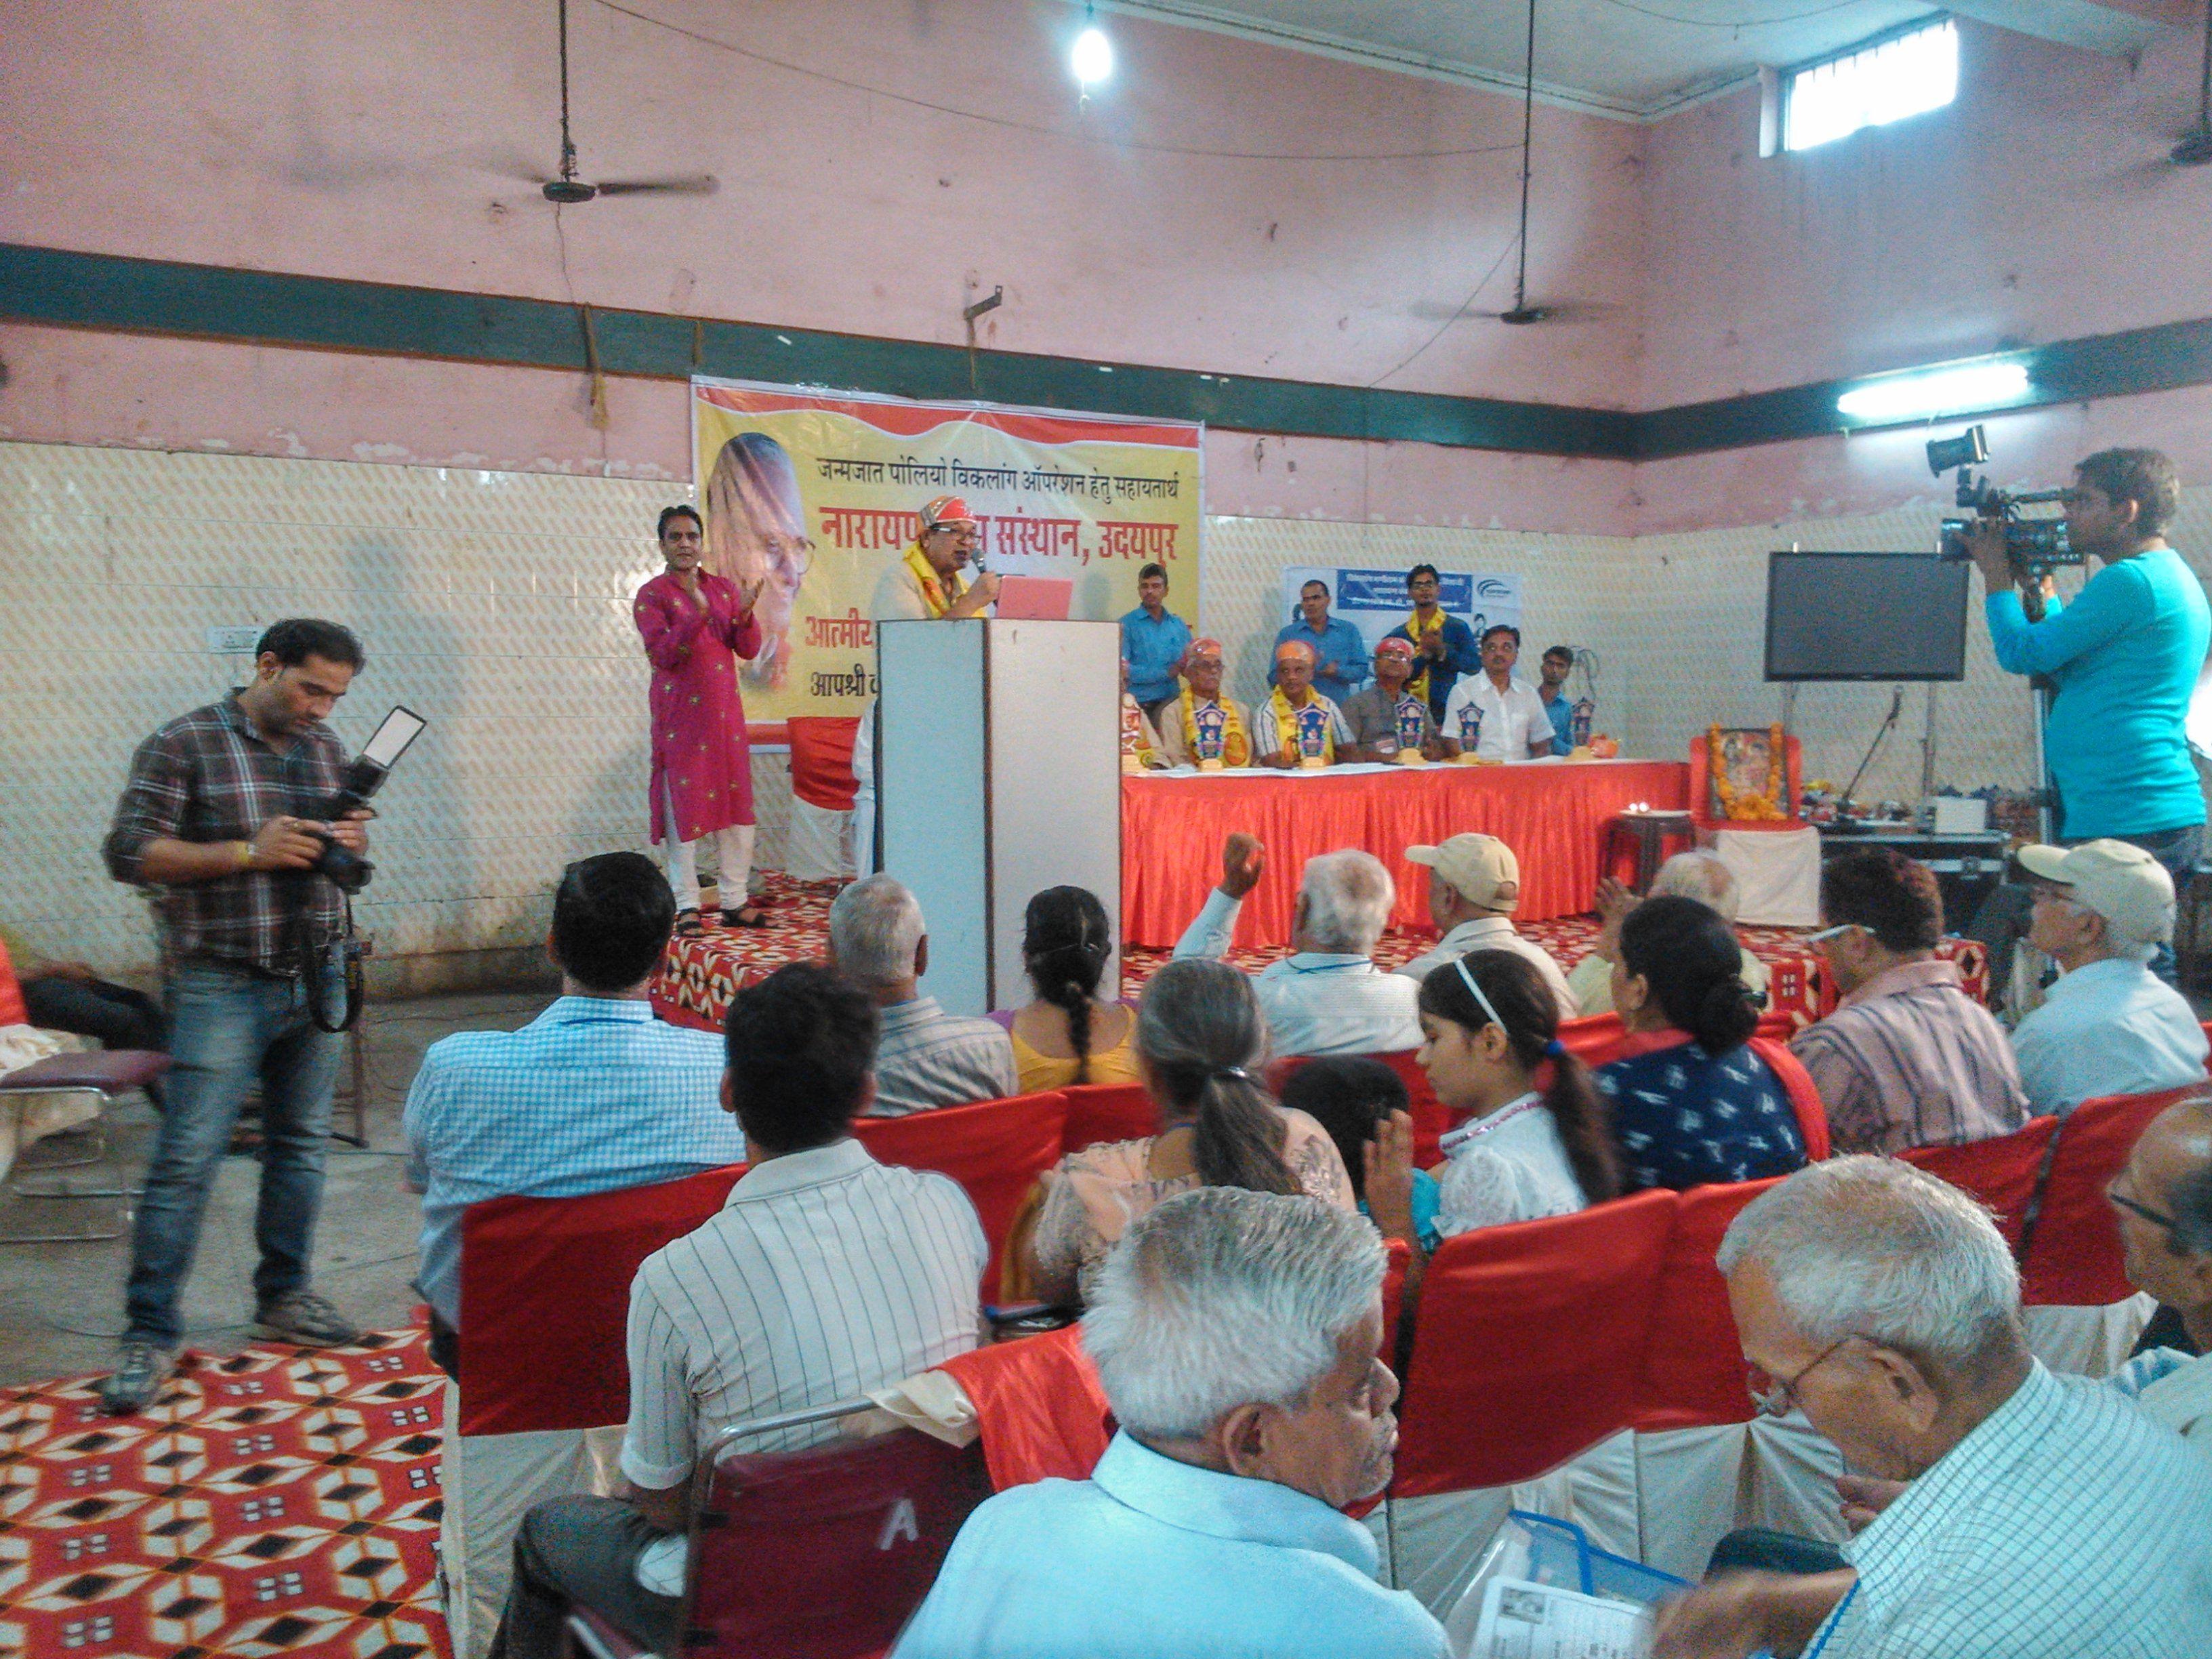 Yesterday Narayan Seva Sansthan organized Sneh Milan event